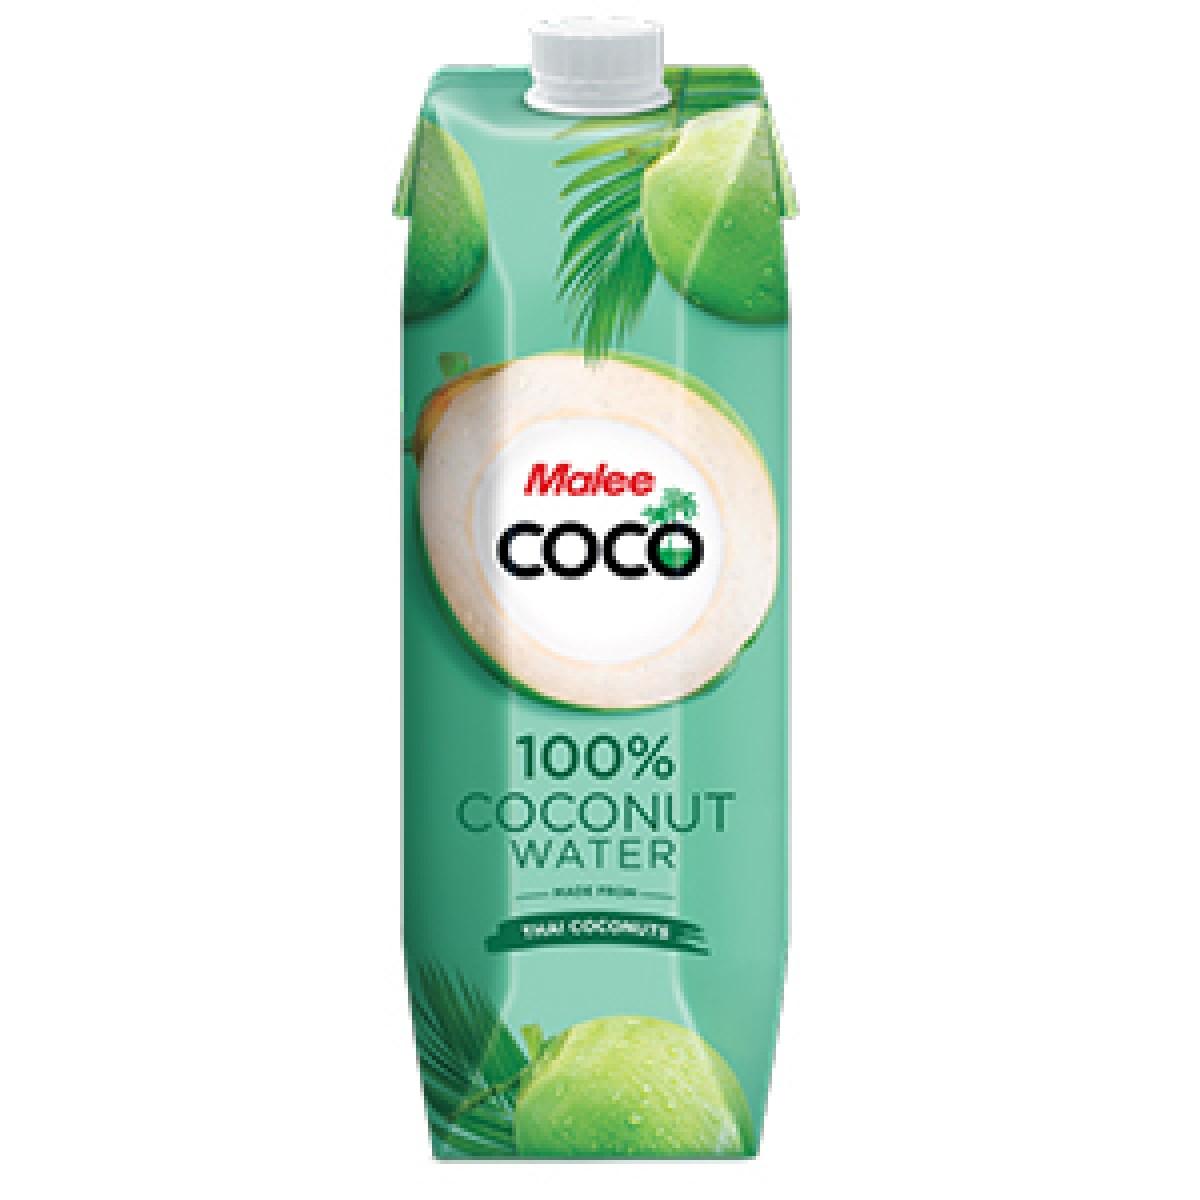 MALEE COCO 100% COCONUT WATER 1L - Kanpeki